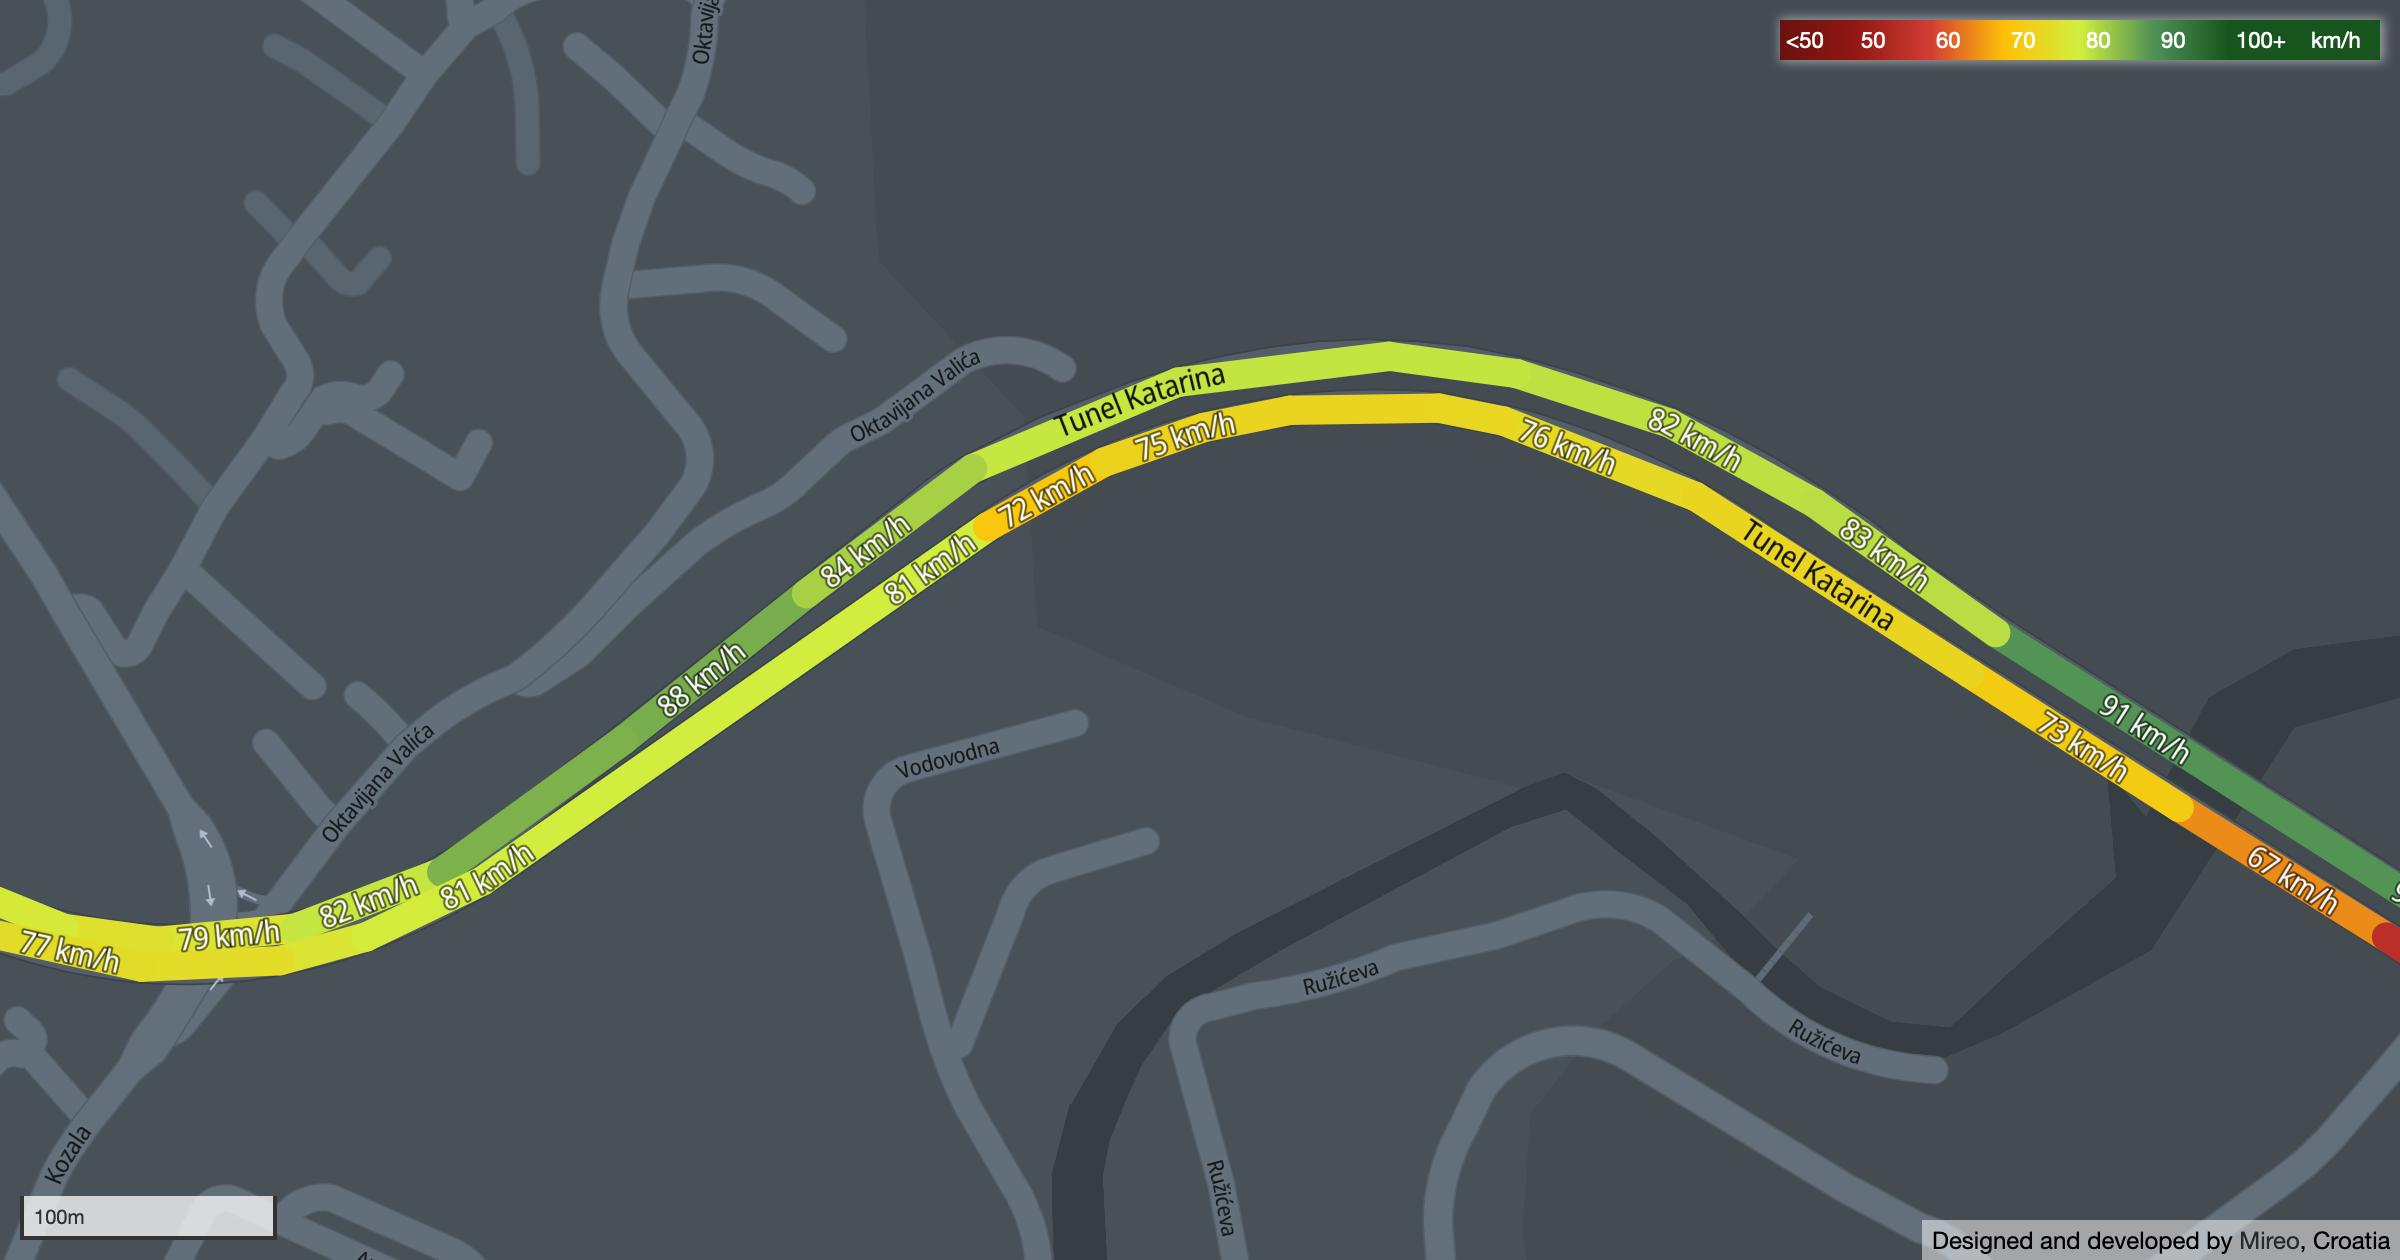 Average travel speed in Katarina tunnel | Brzine u Tunelu Katarina